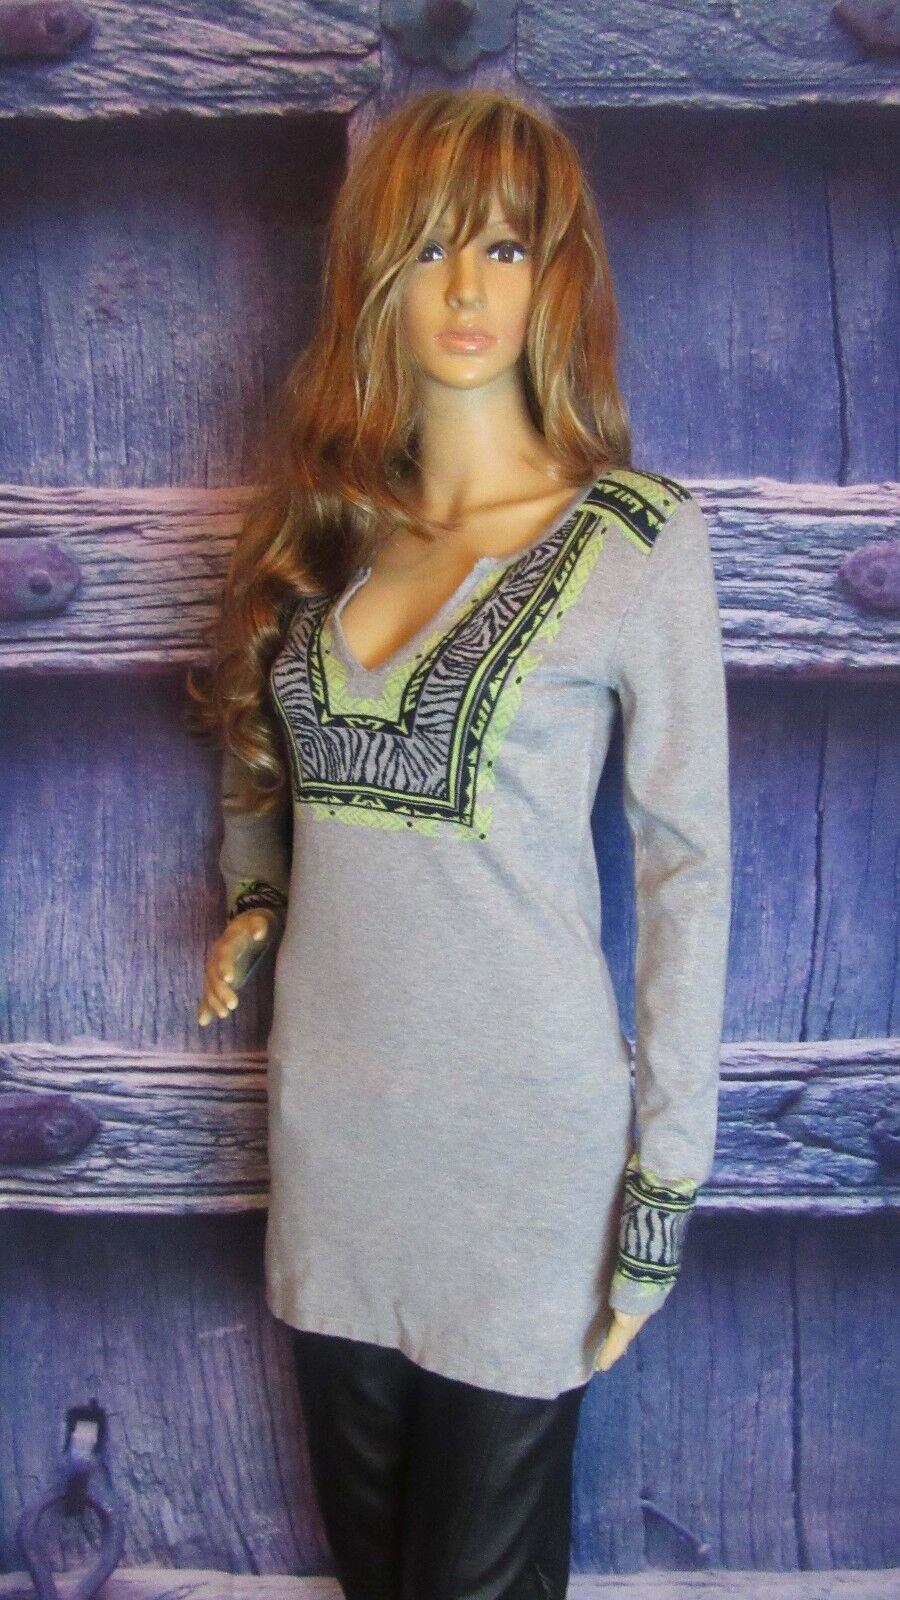 Anthropologie Anthropologie Anthropologie Hale Bob Geometric Tunic Cardigan Sweater Top. Size XS Super Soft. 8c7f94